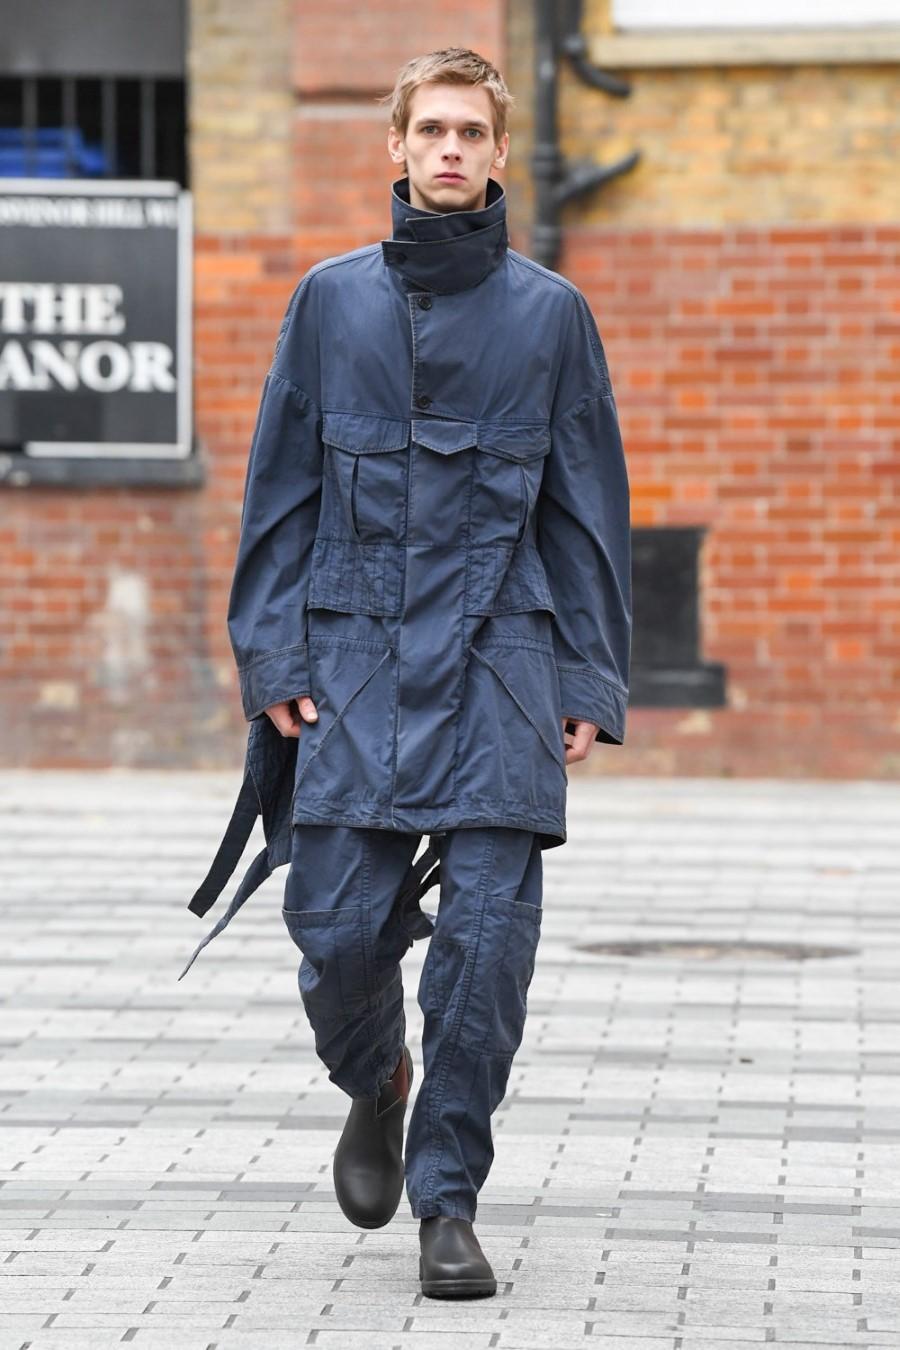 Chalayan Fall Winter 2020 - London Fashion Week Men's